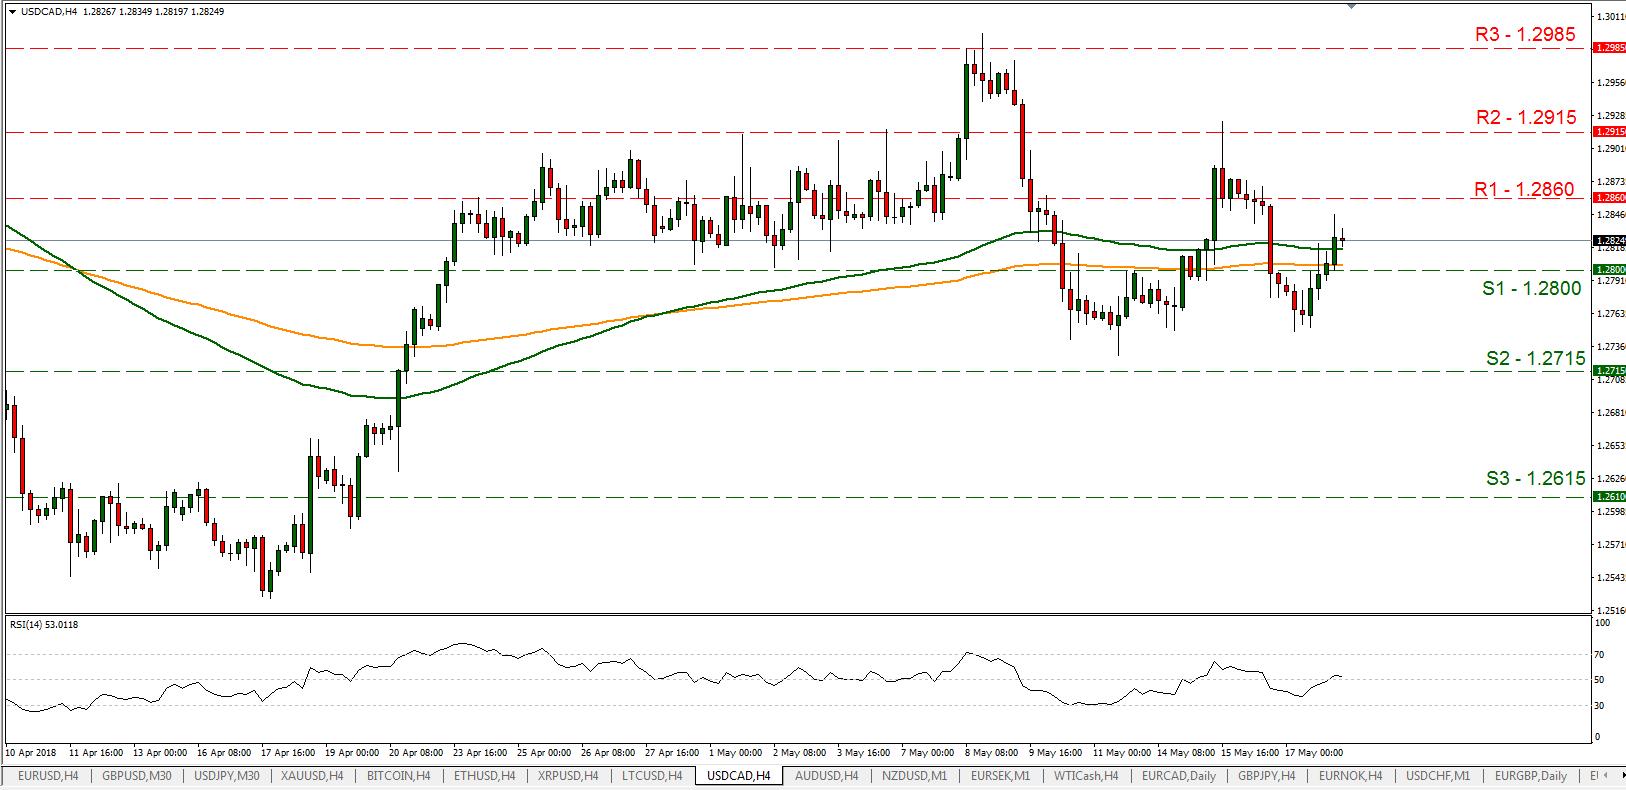 USD/CAD 18/05/2018 | EconAlerts